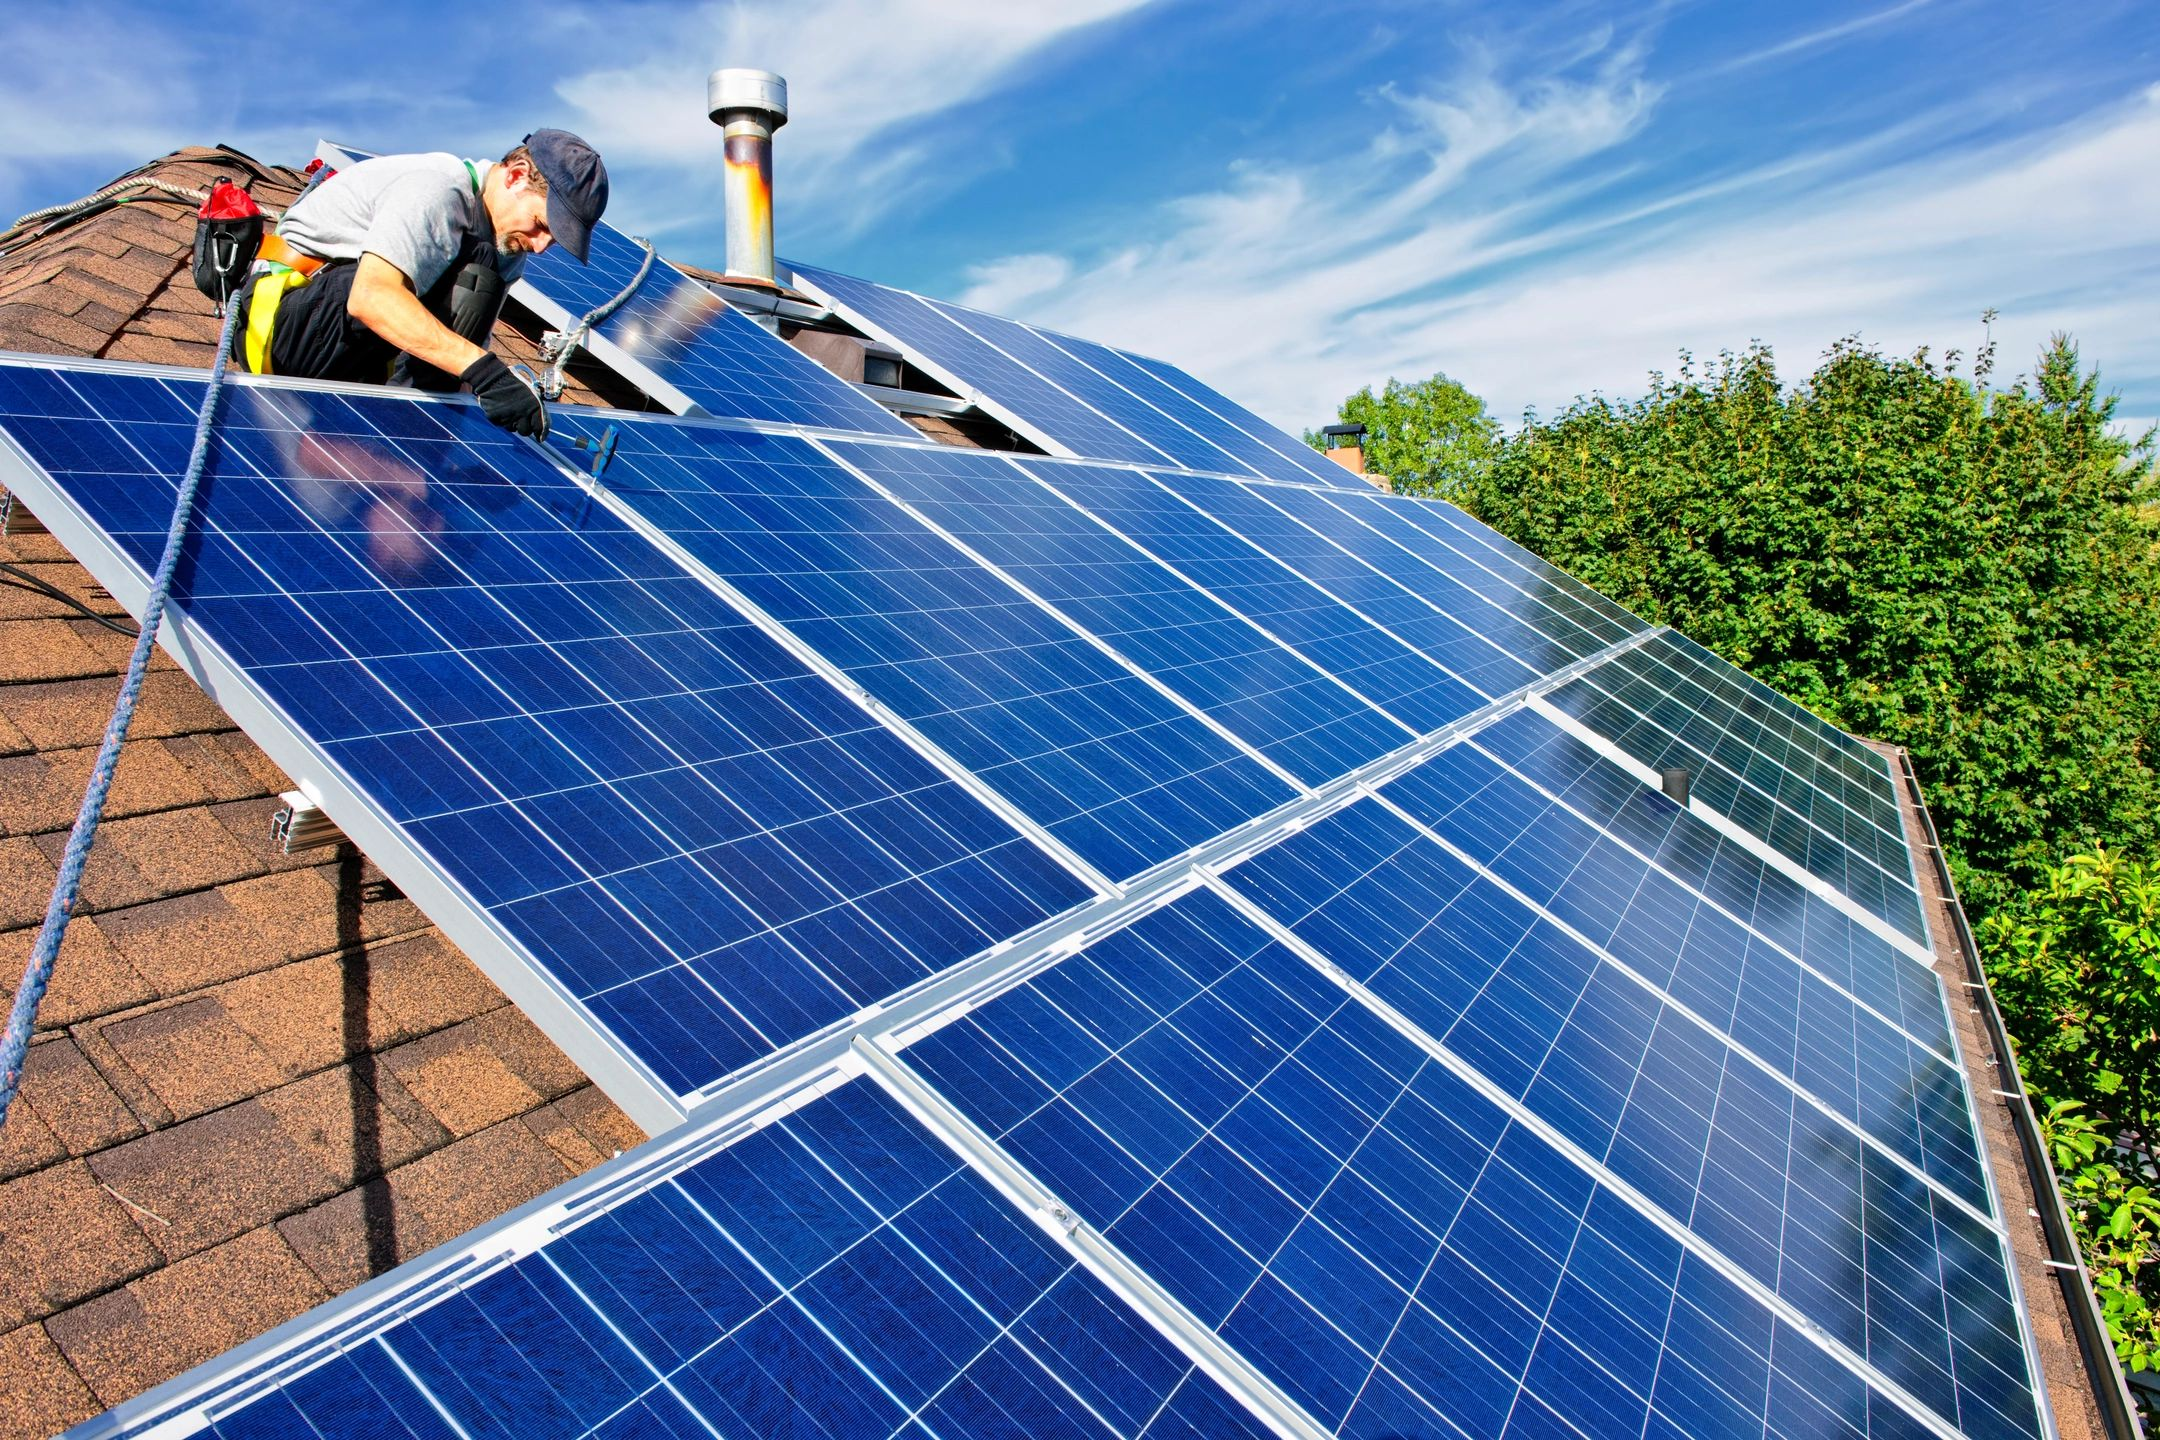 Vivint solar reviews california - Cfa Asks California Attorney General To Investigate Solar Industry Campaign For Accountability